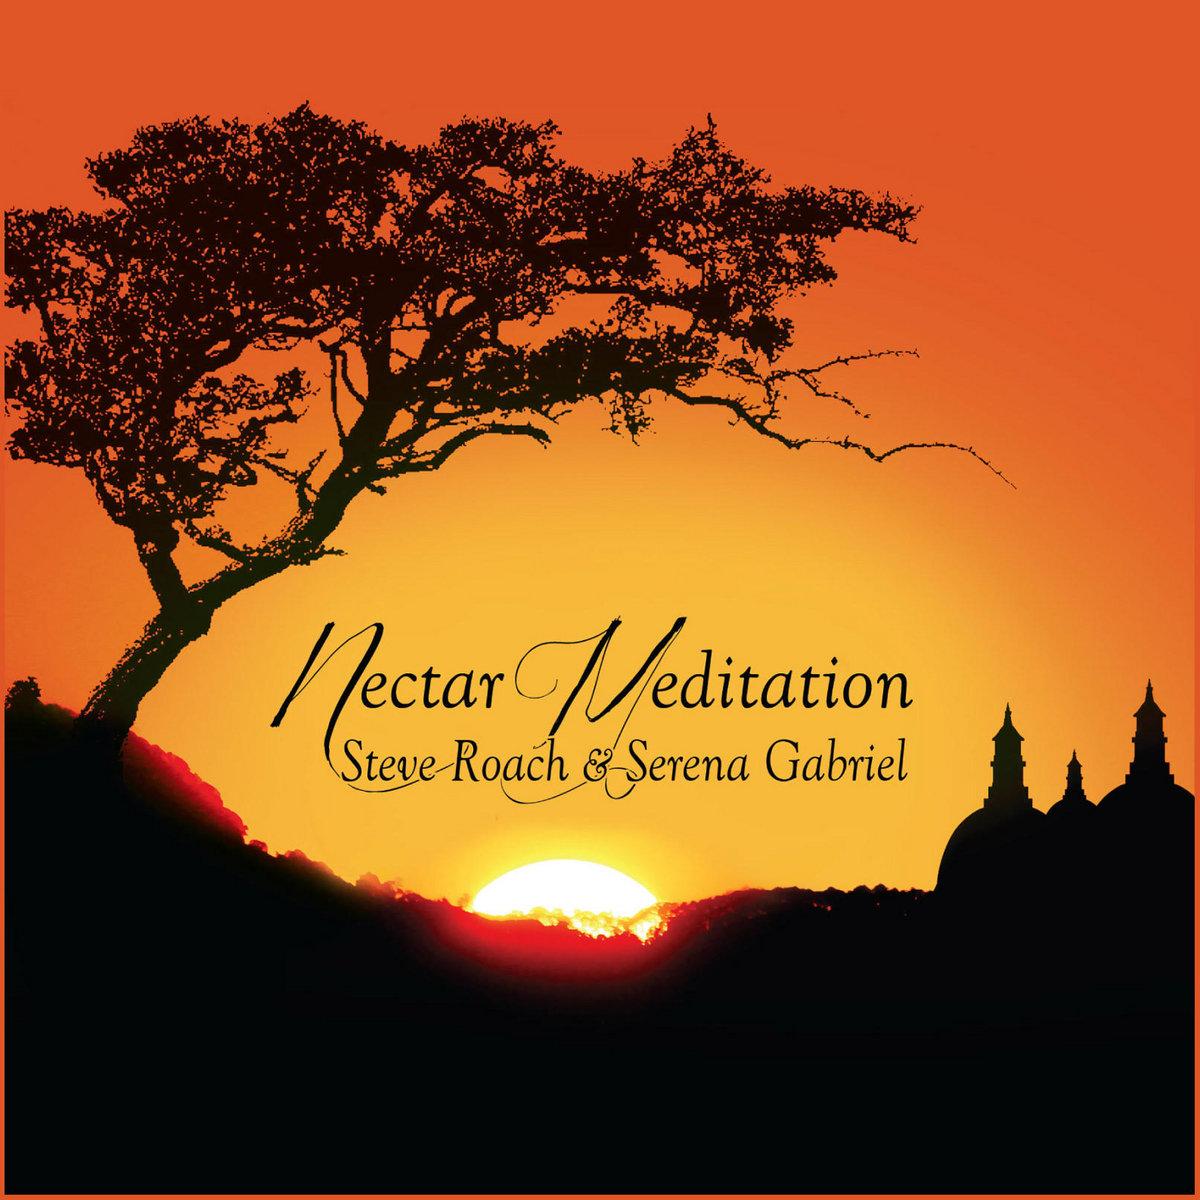 Steve Roach & Serena Gabriel — Nectar Meditation